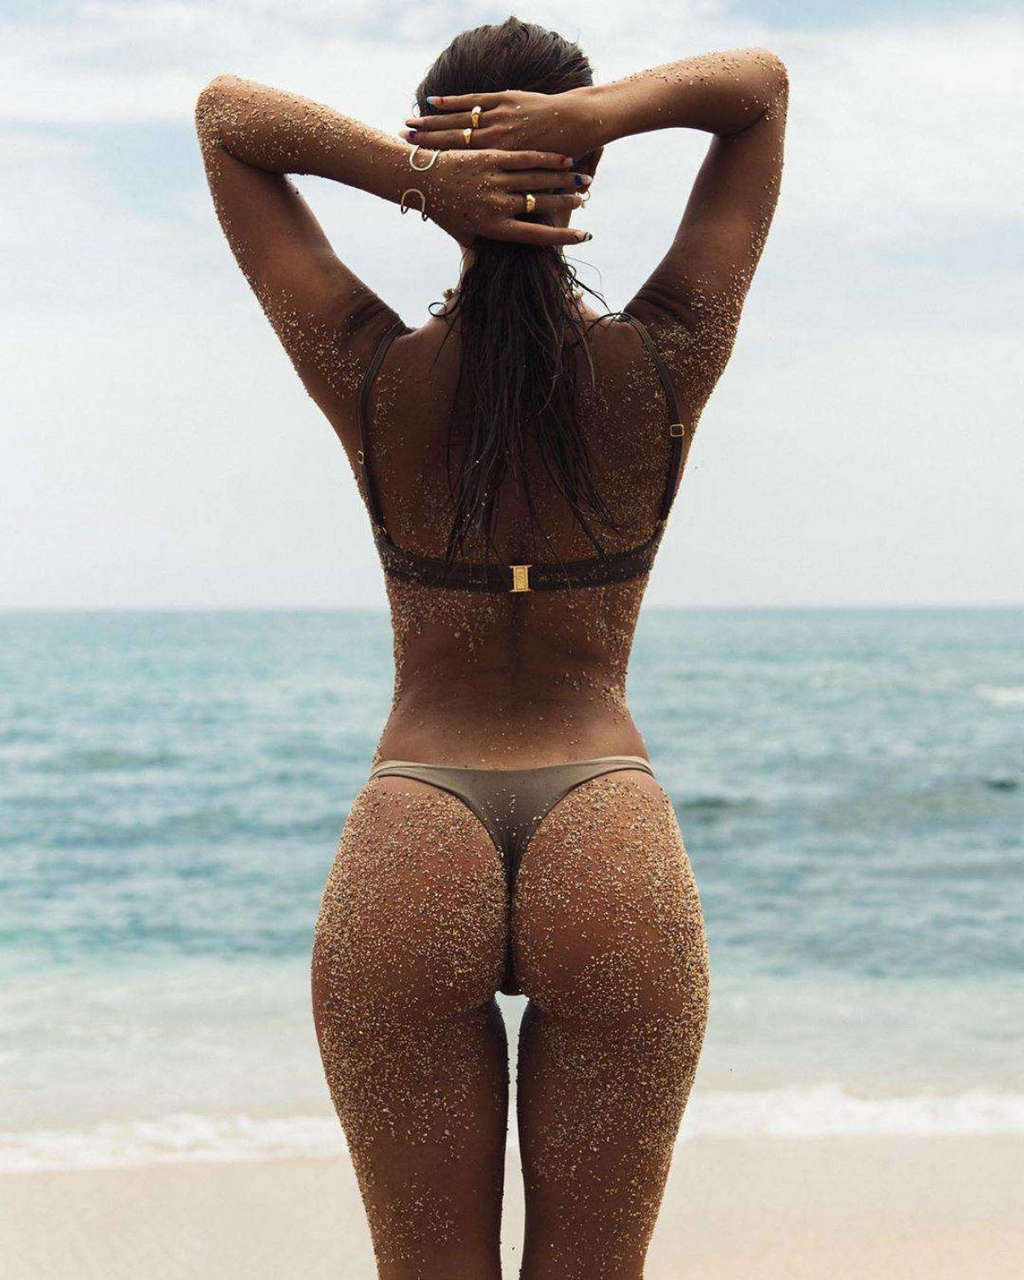 Carmella Rose Bikini Photoshoot Beach